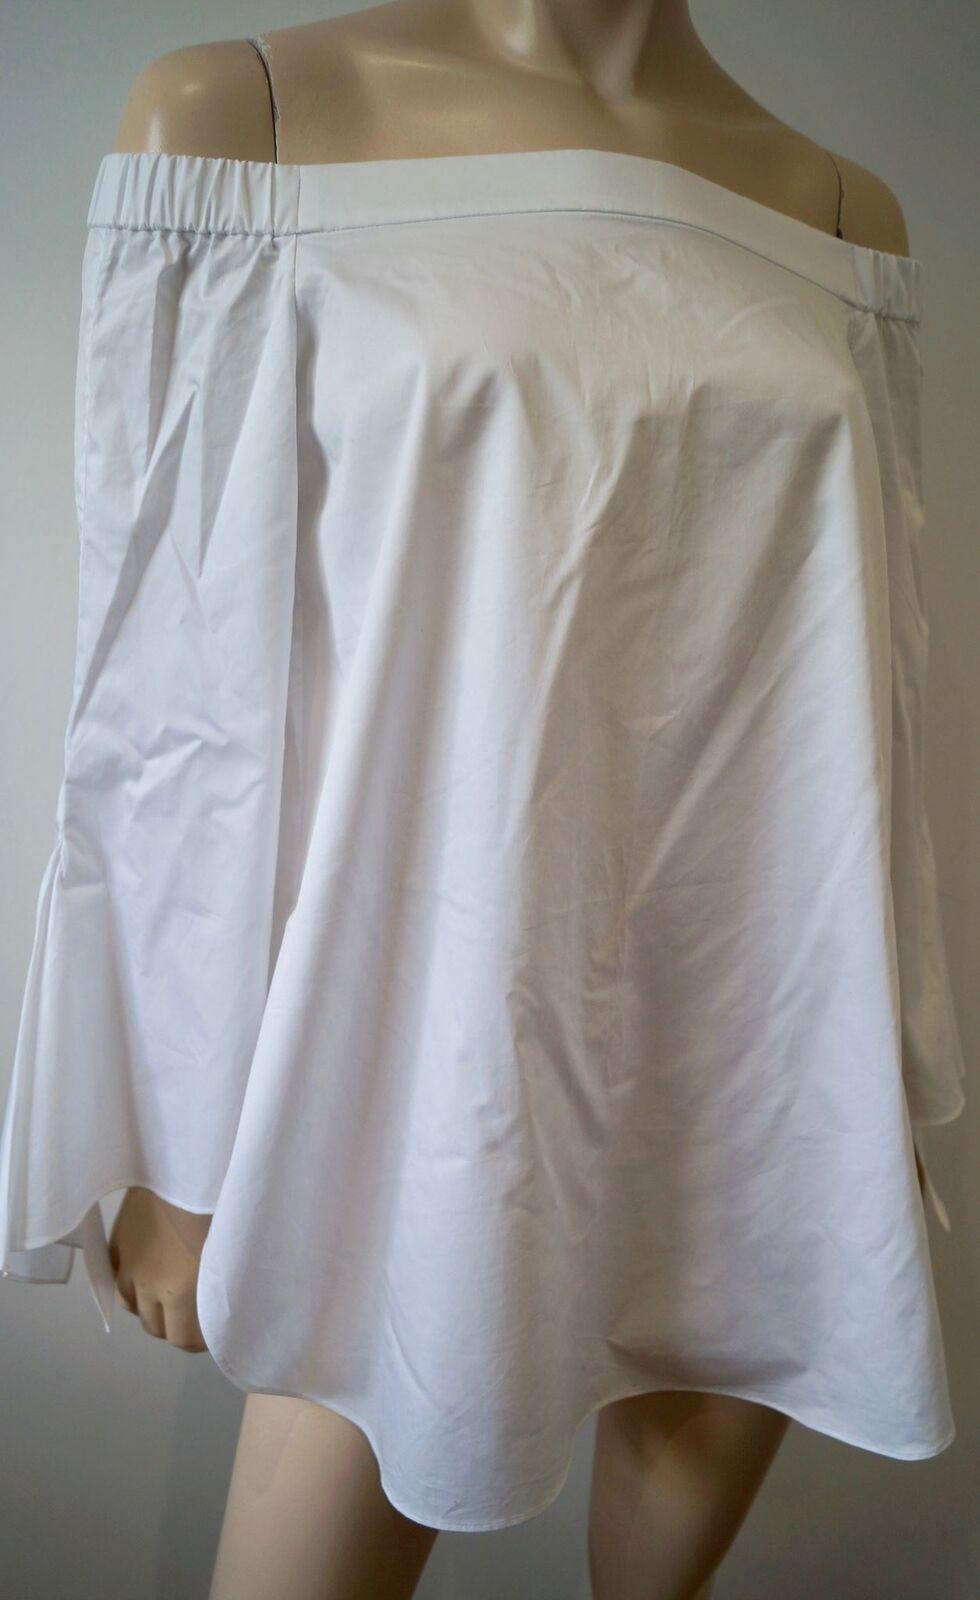 TIBI White Cotton Elasticated Off Shoulder 3 4 Flare Sleeve Blouse Top UK10 BNWT